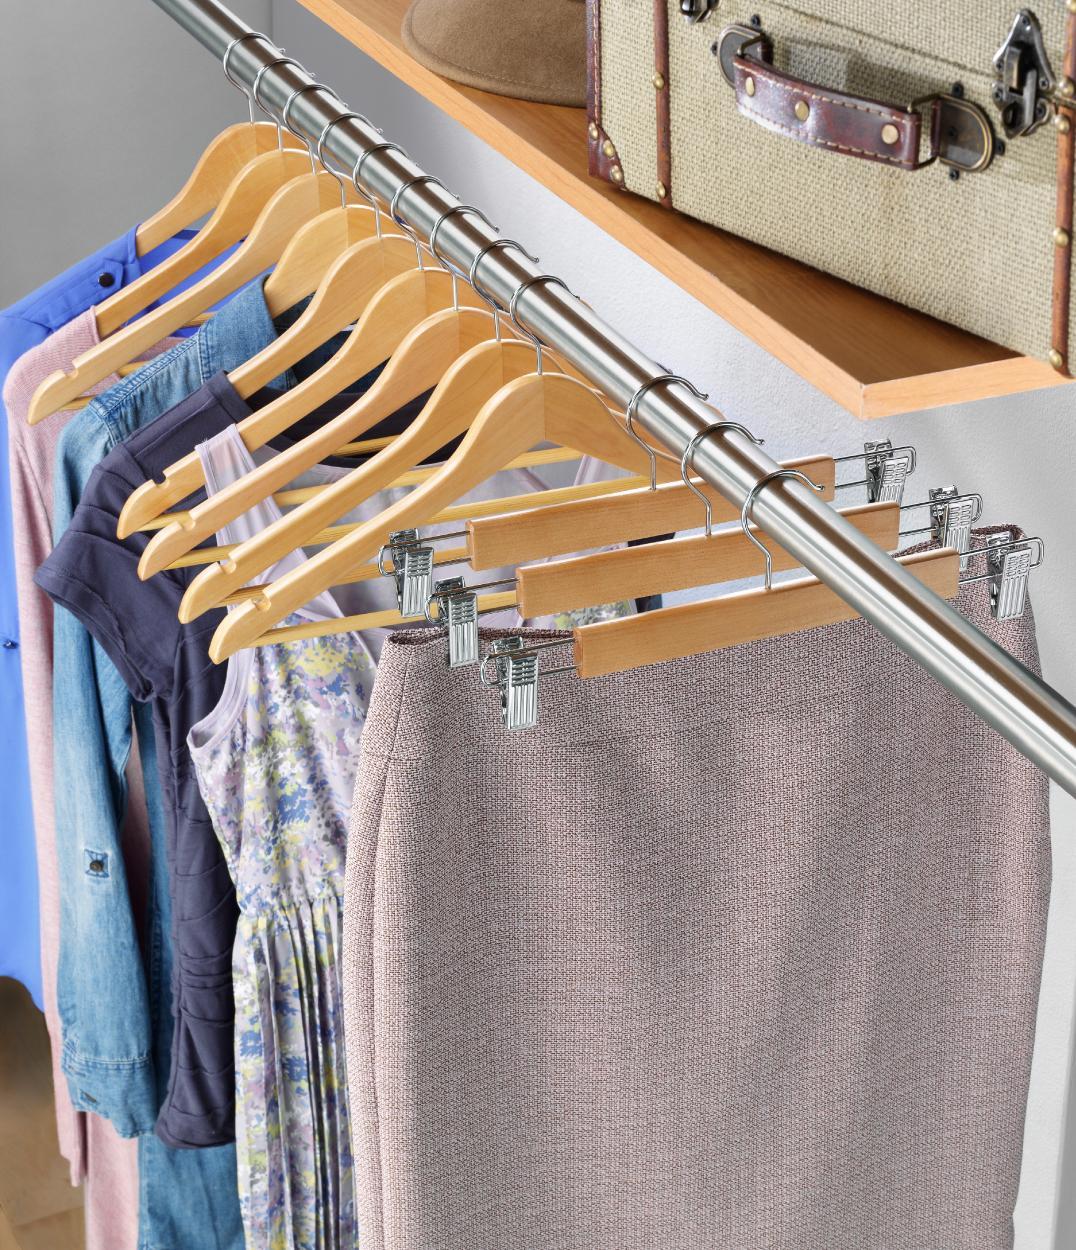 Amazon.com: Whitmor GRADE A Natural Wood Suit Hangers (Set